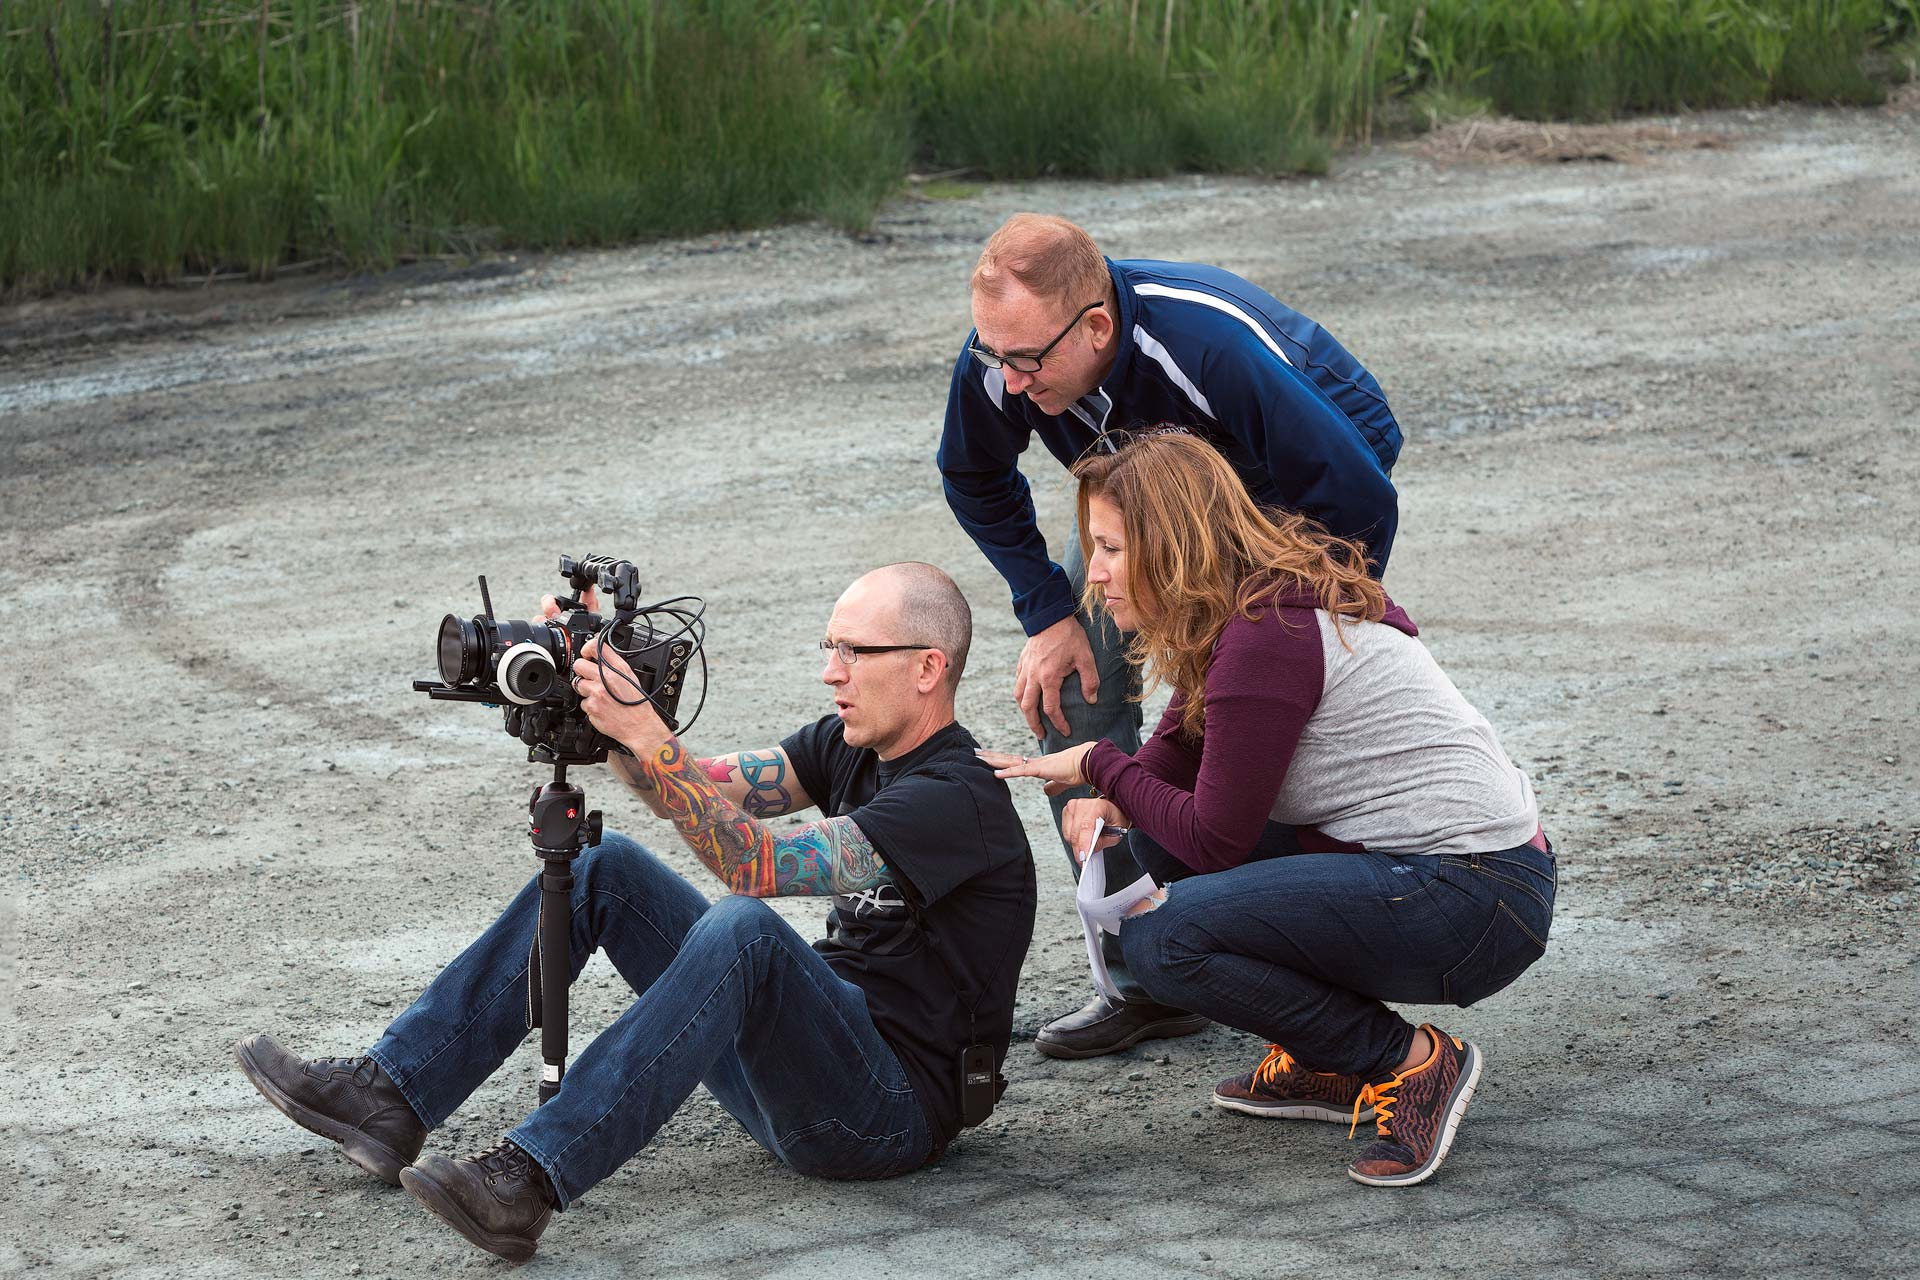 Capturing the Scene